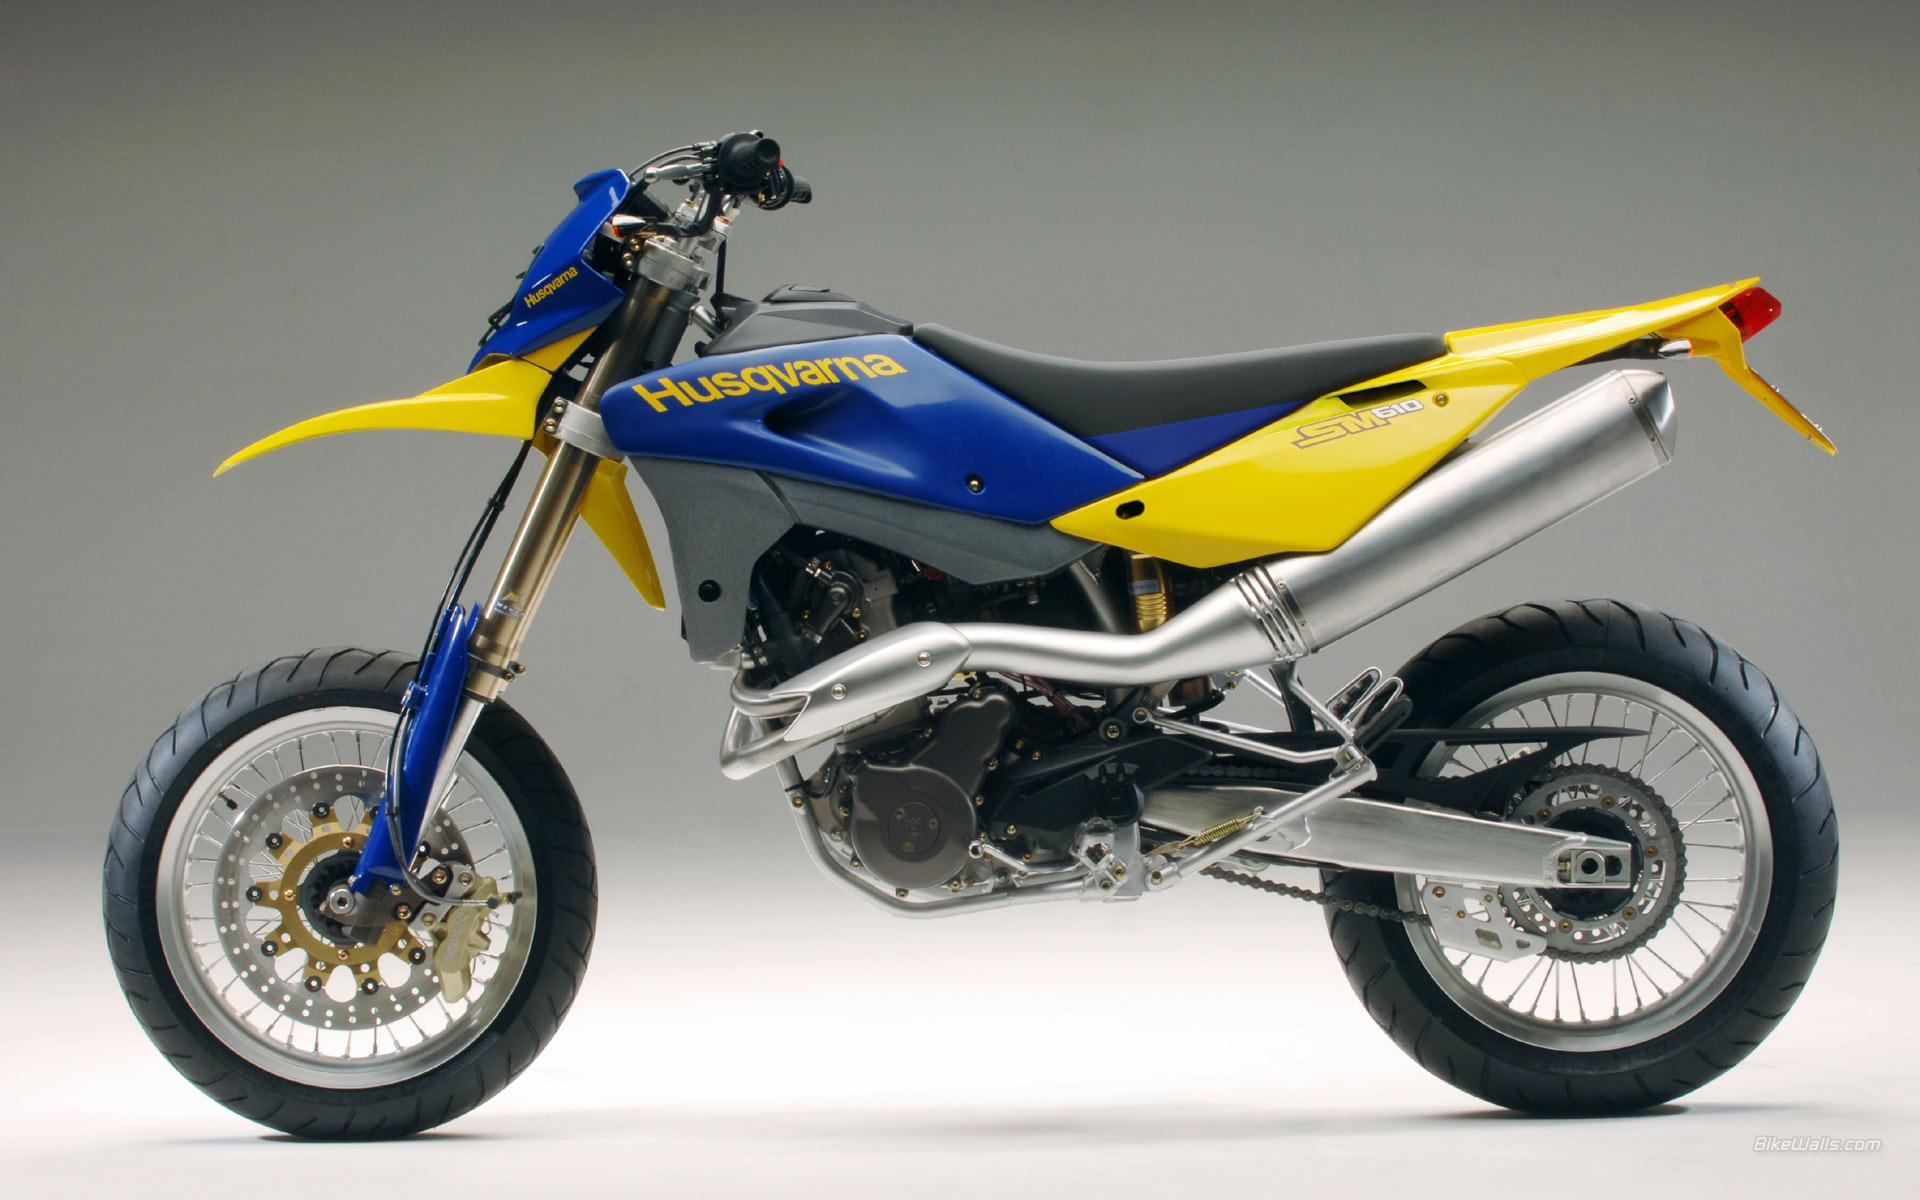 Husqvarna motorcycles pics specs and list of models 1920x1200